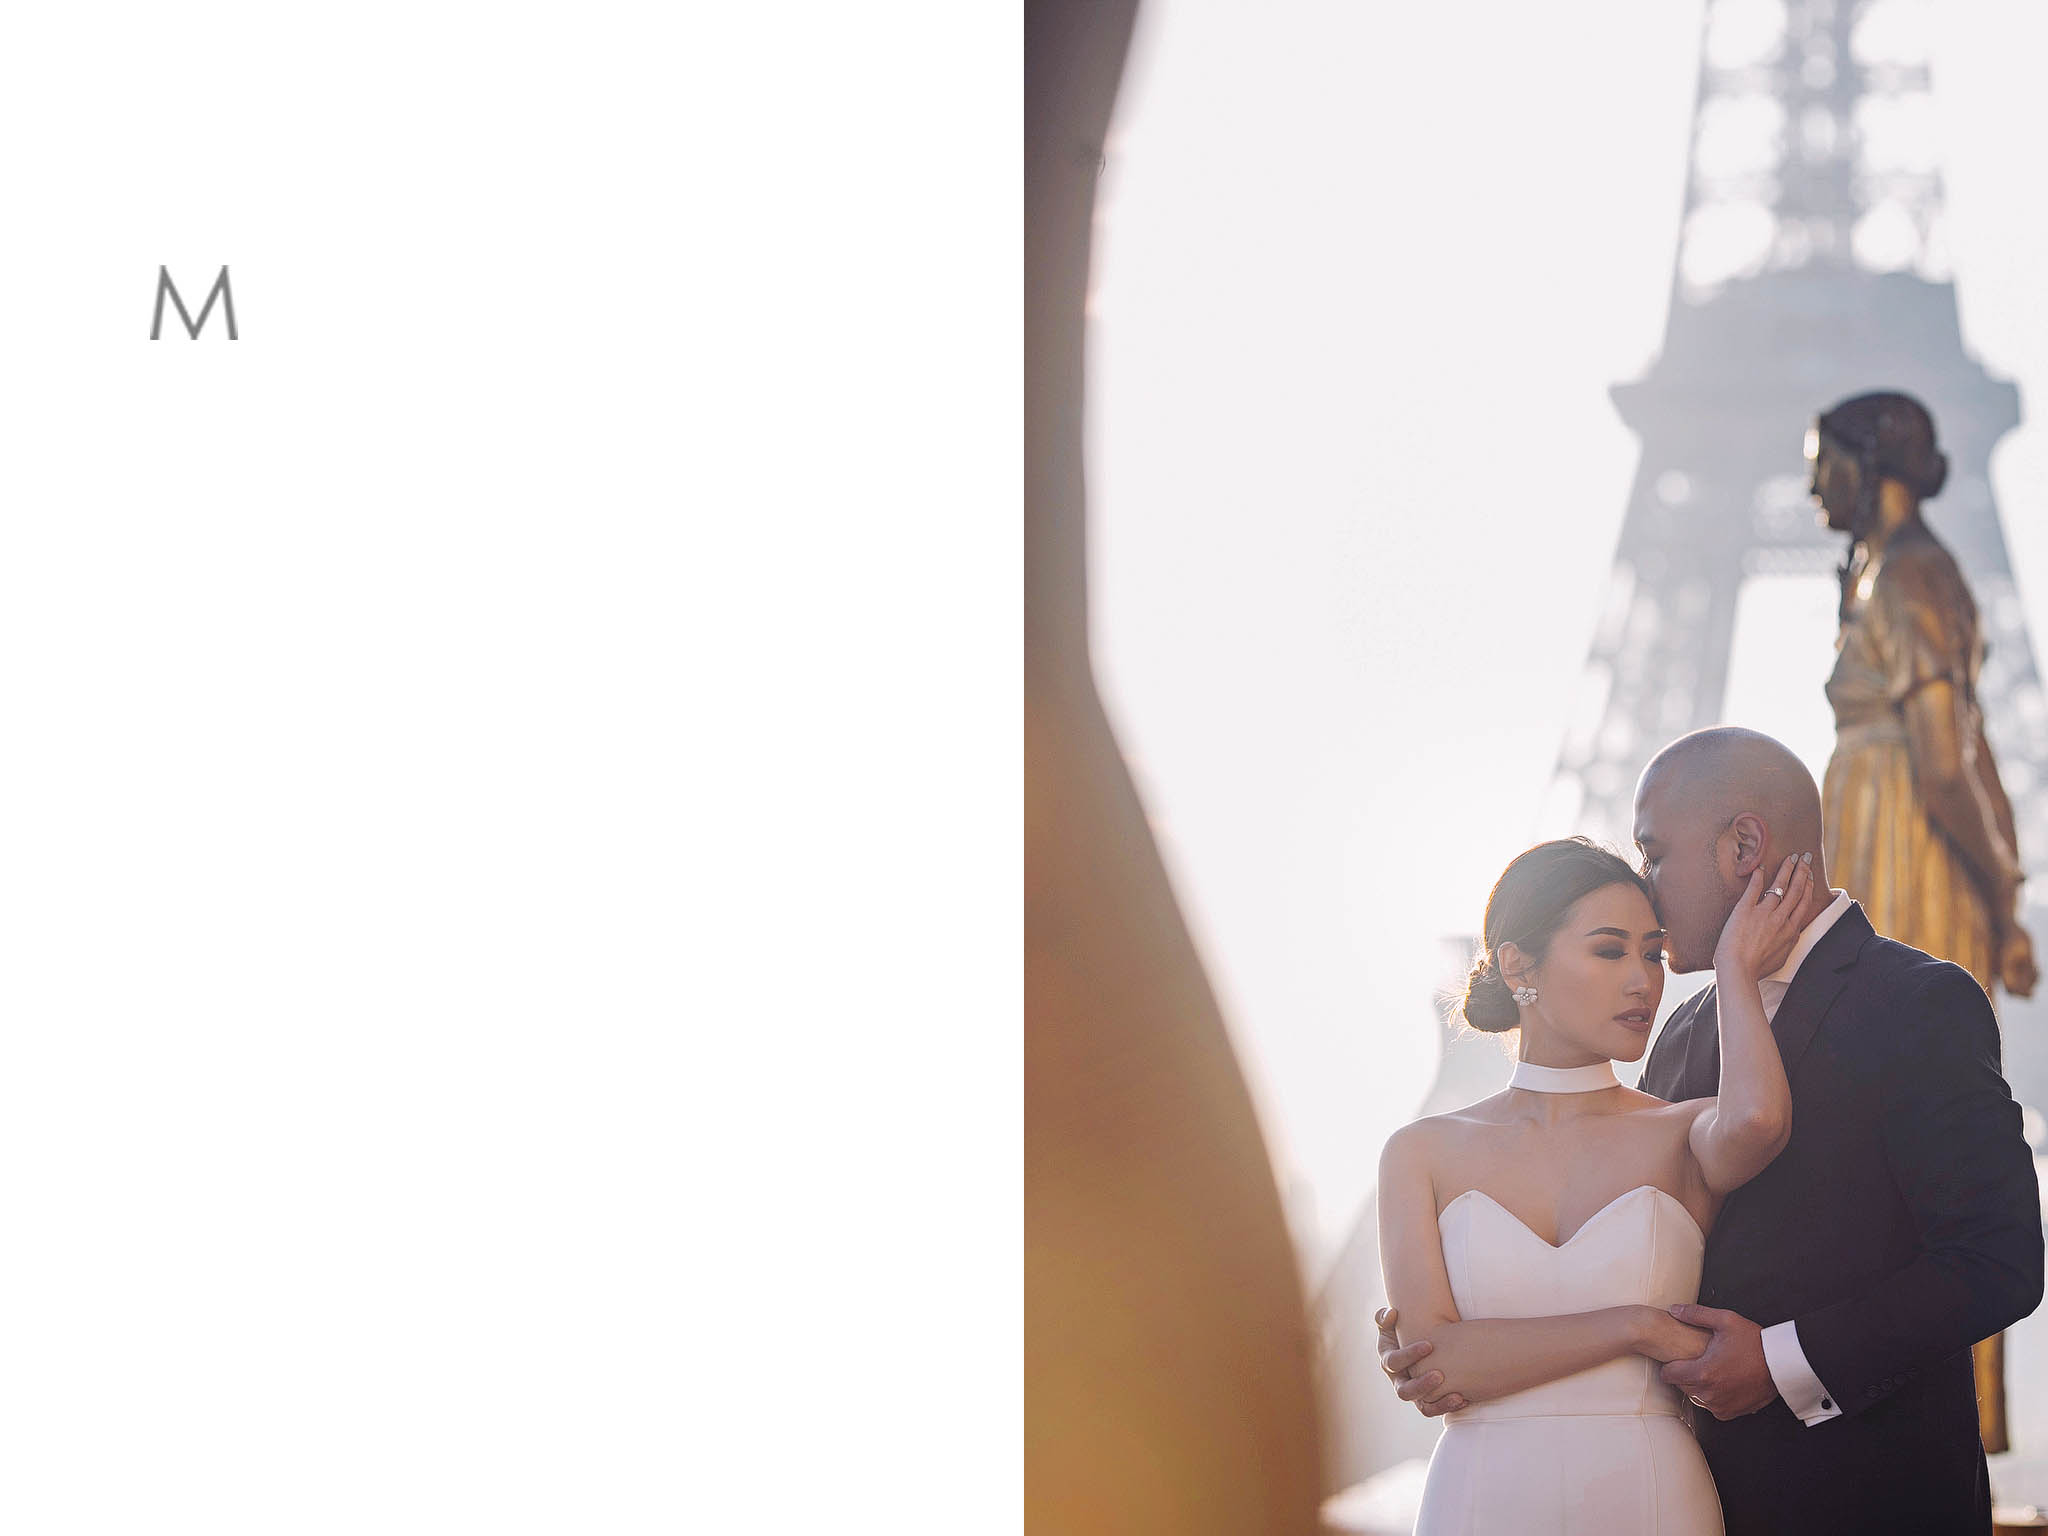 Paris_Mikki_Miko_077